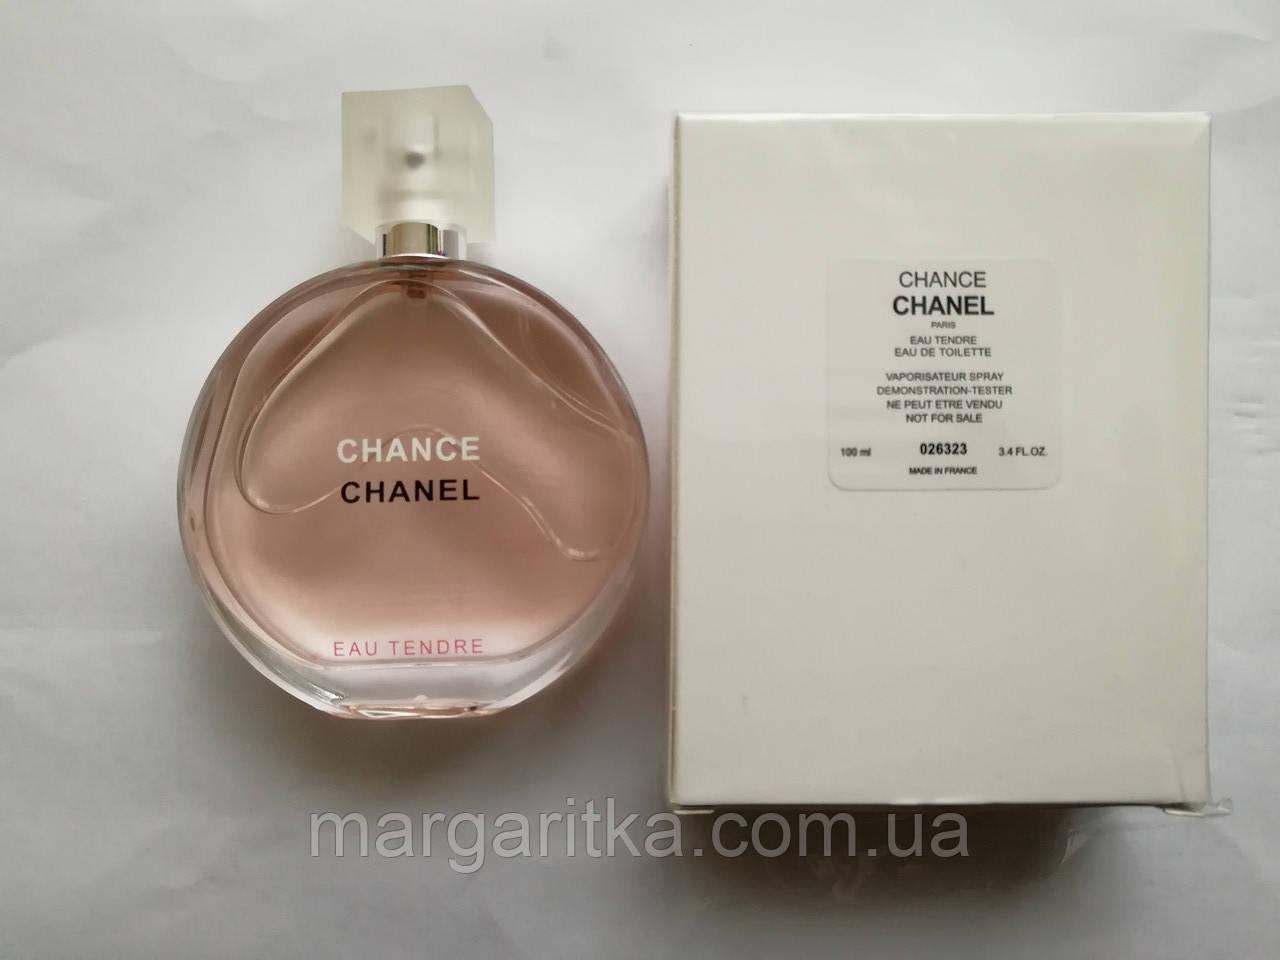 Парфюмированная вода Chanel Chance Eau Tendre Тестер(копия) качества ЛЮКС